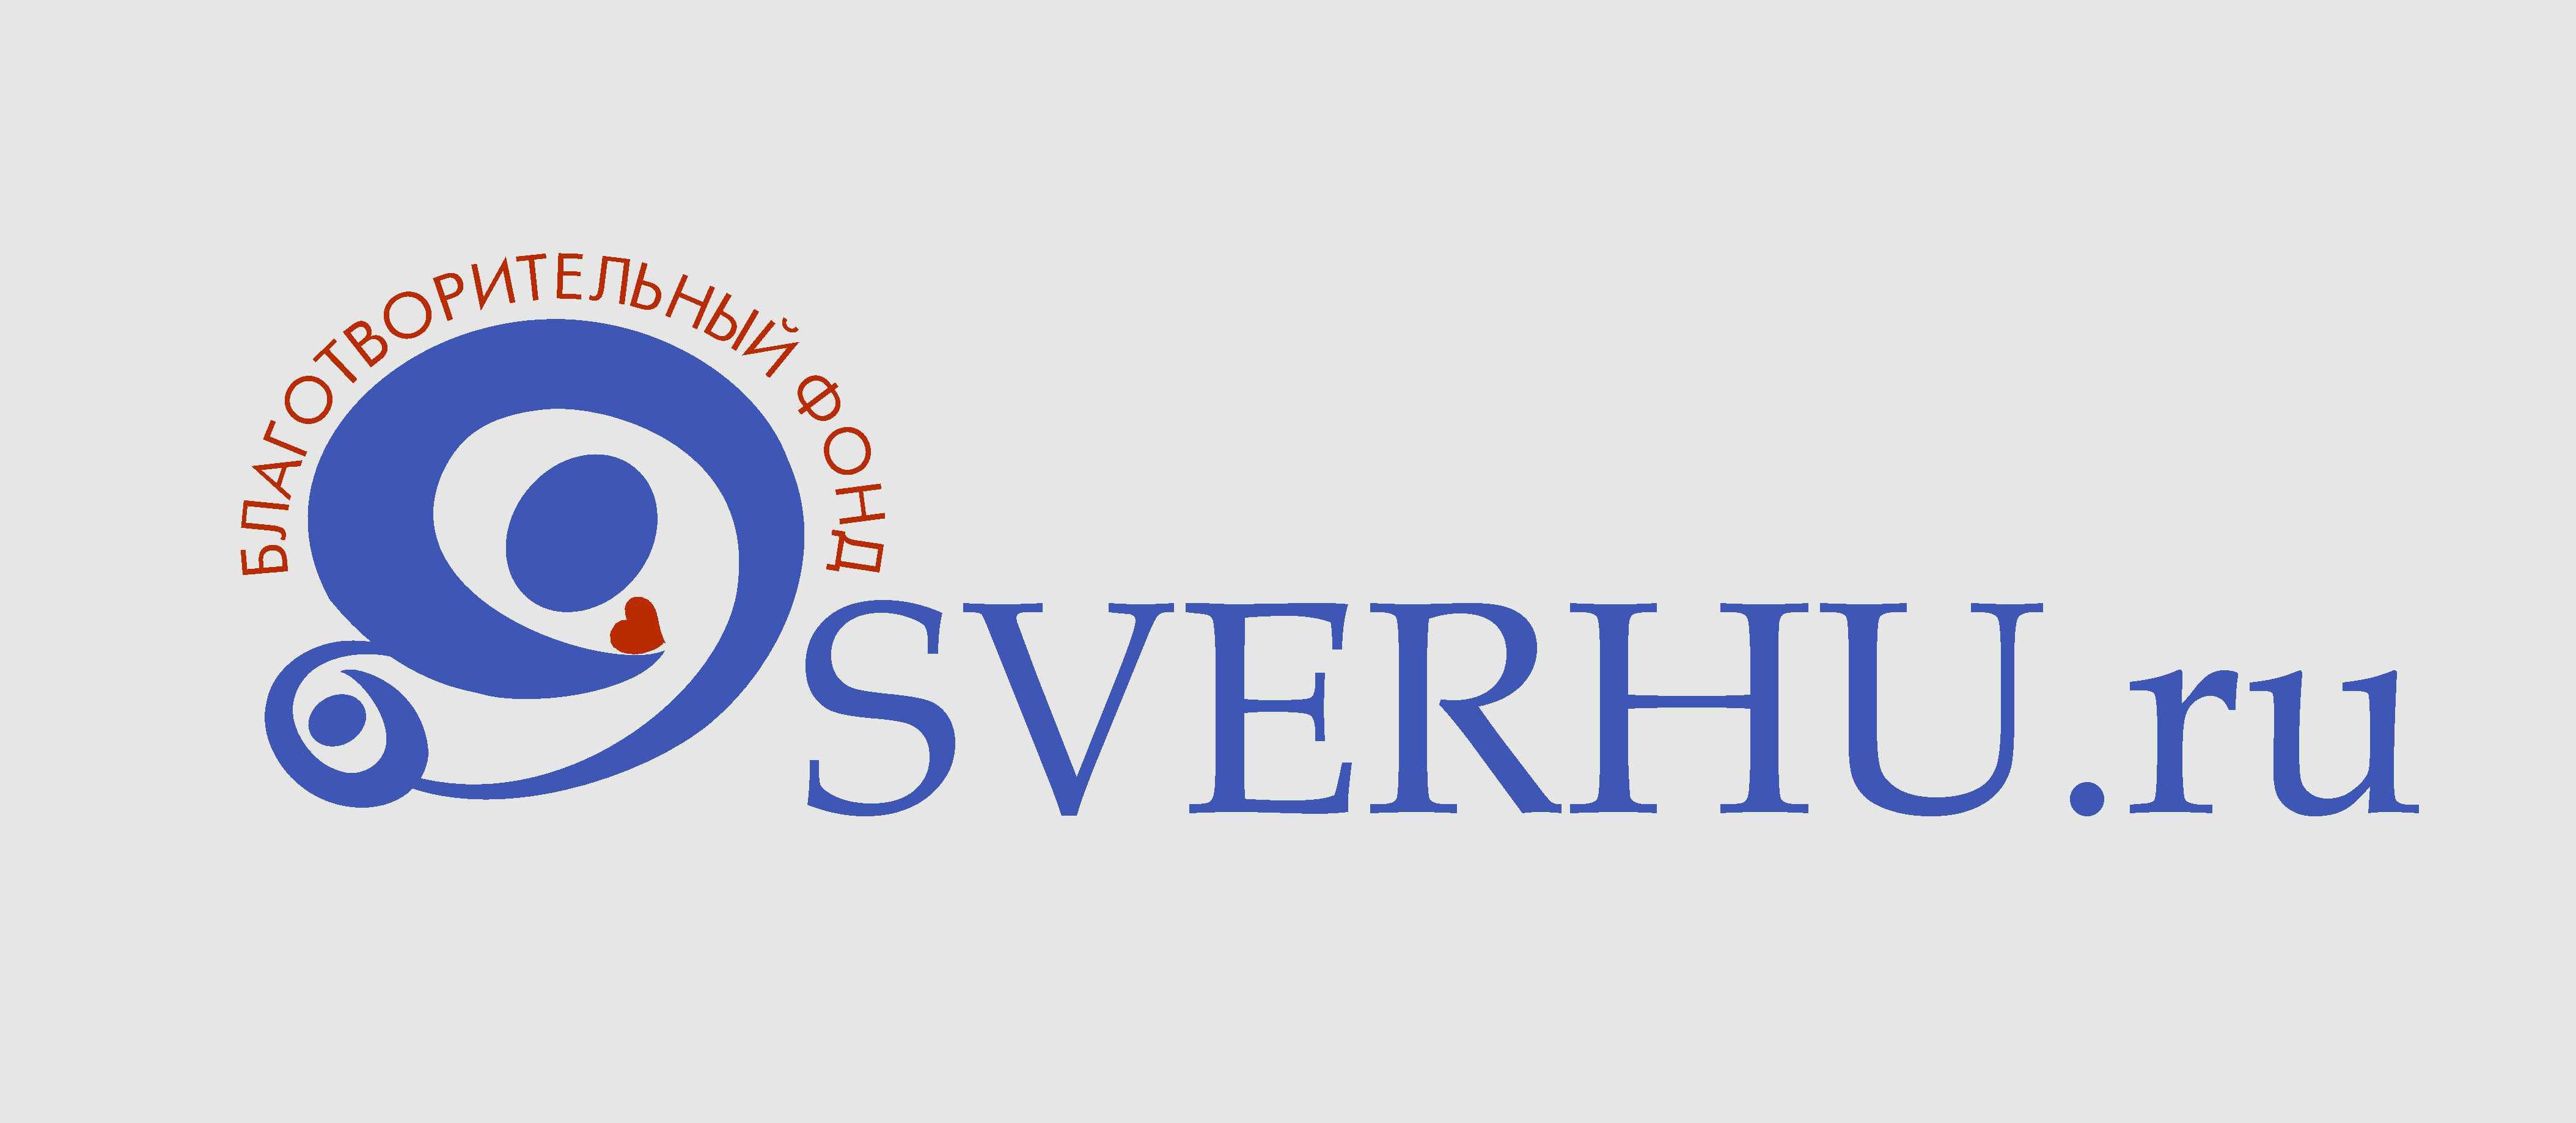 логотип  фото f_30055c849a0eaa88.jpg